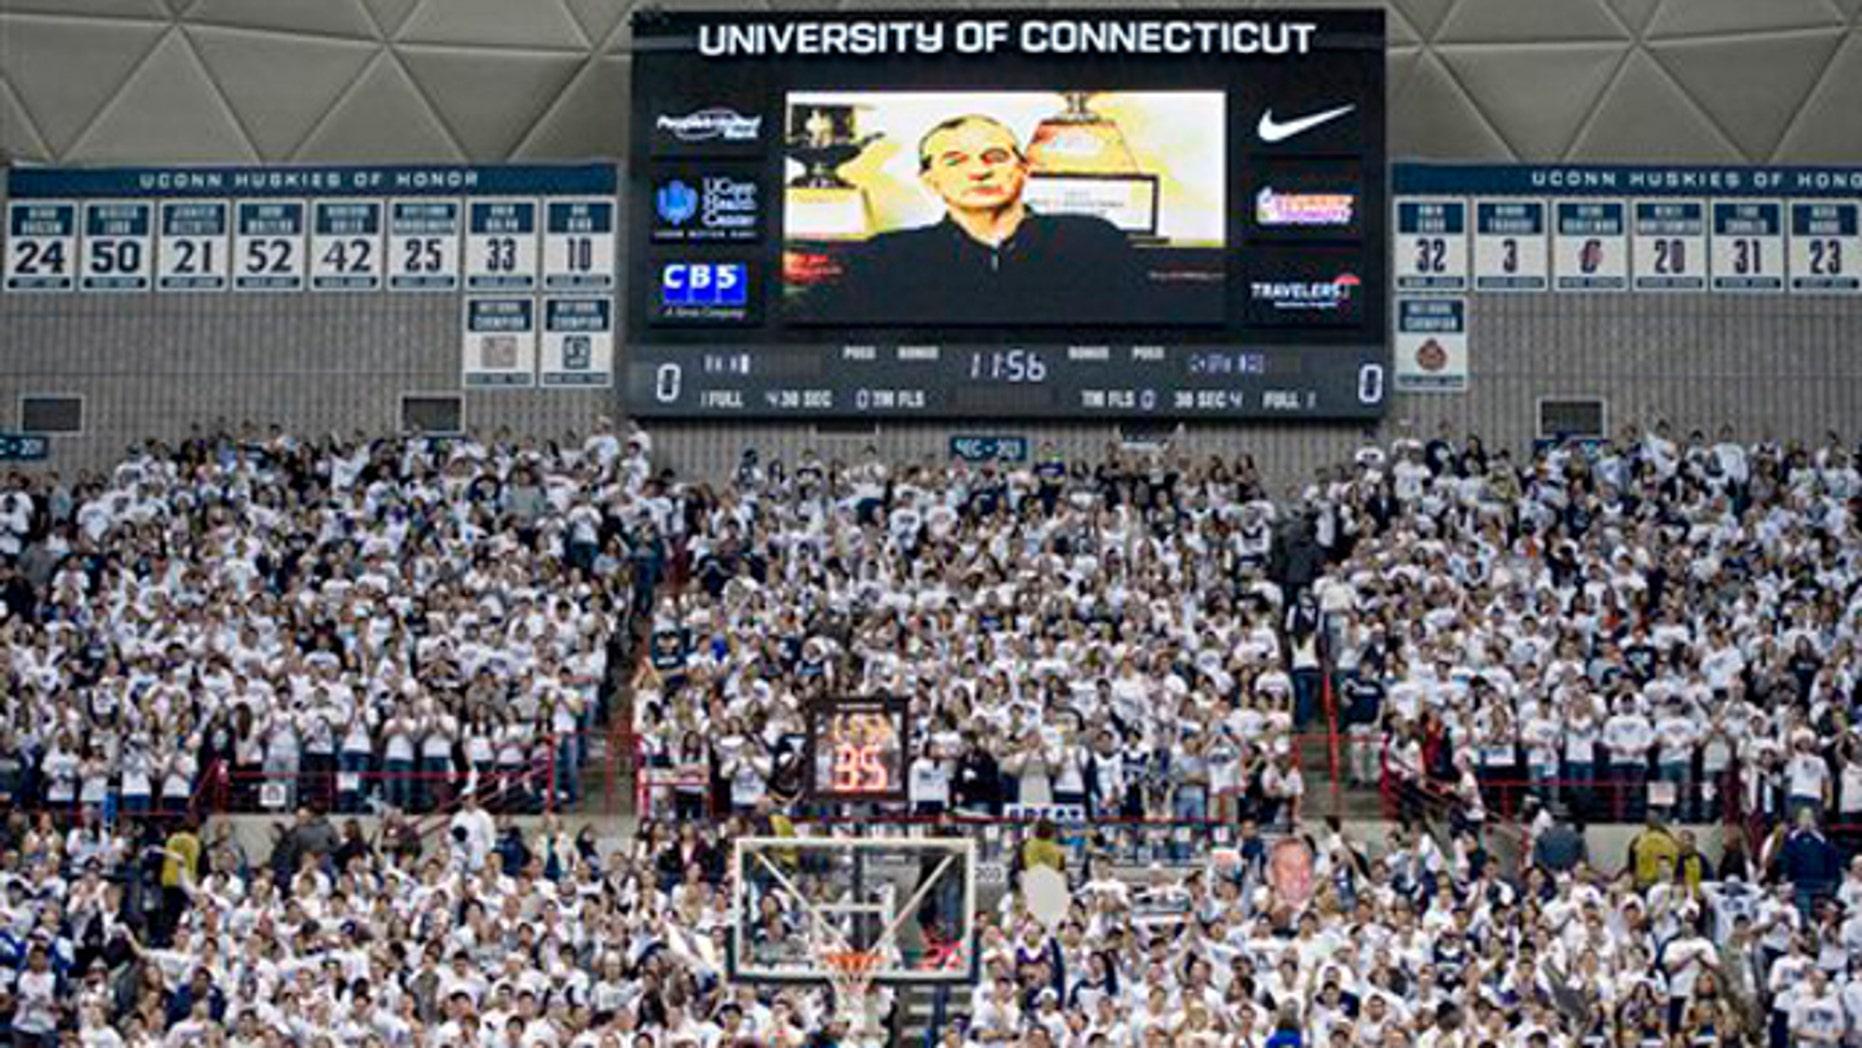 Feb. 25, 2012: Connecticut head coach Jim Calhoun addresses fans prior to an NCAA college basketball game against Syracuse in Storrs, Conn.